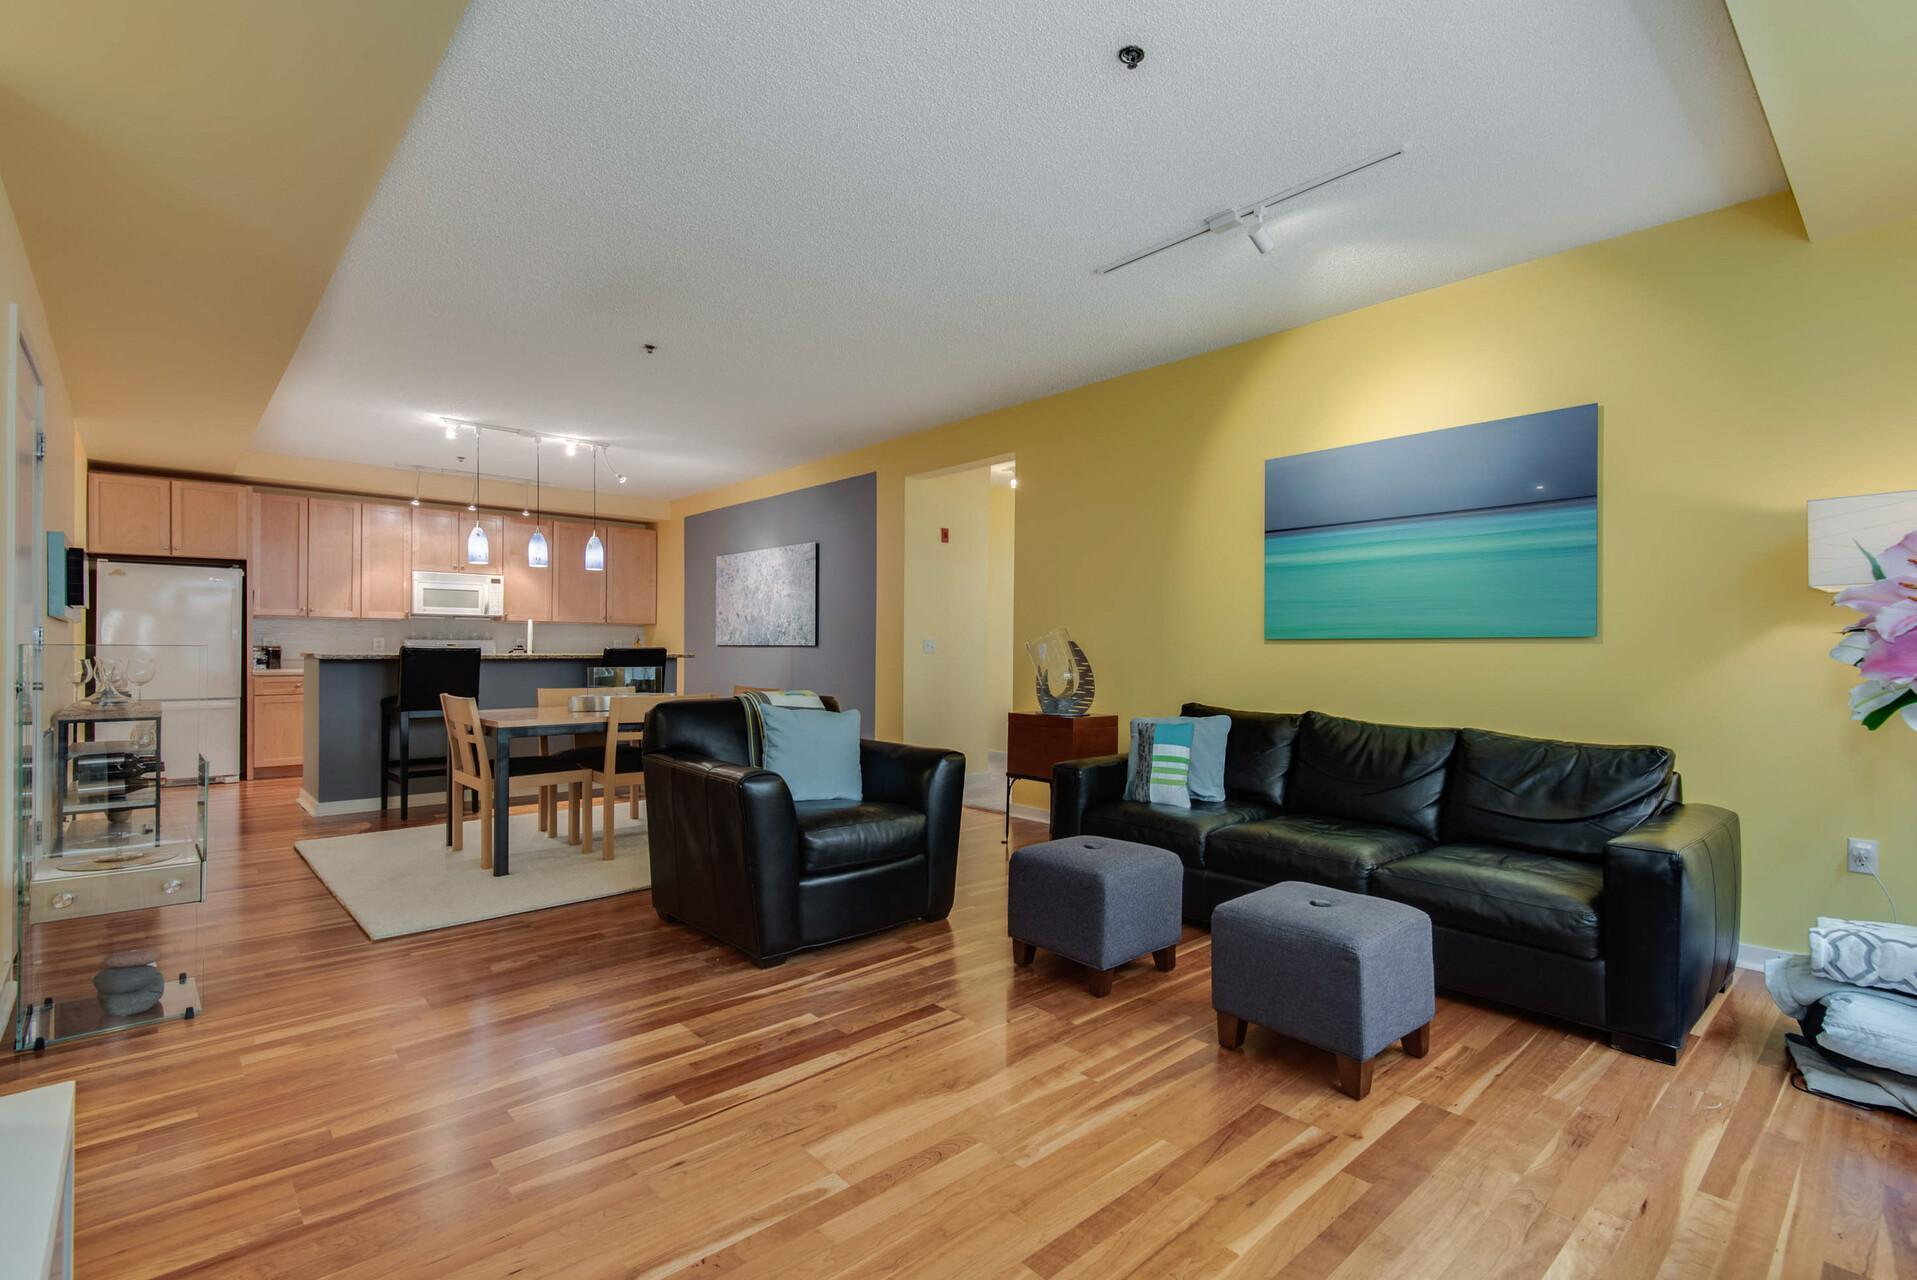 209 8th Street E #113 Property Photo - Saint Paul, MN real estate listing